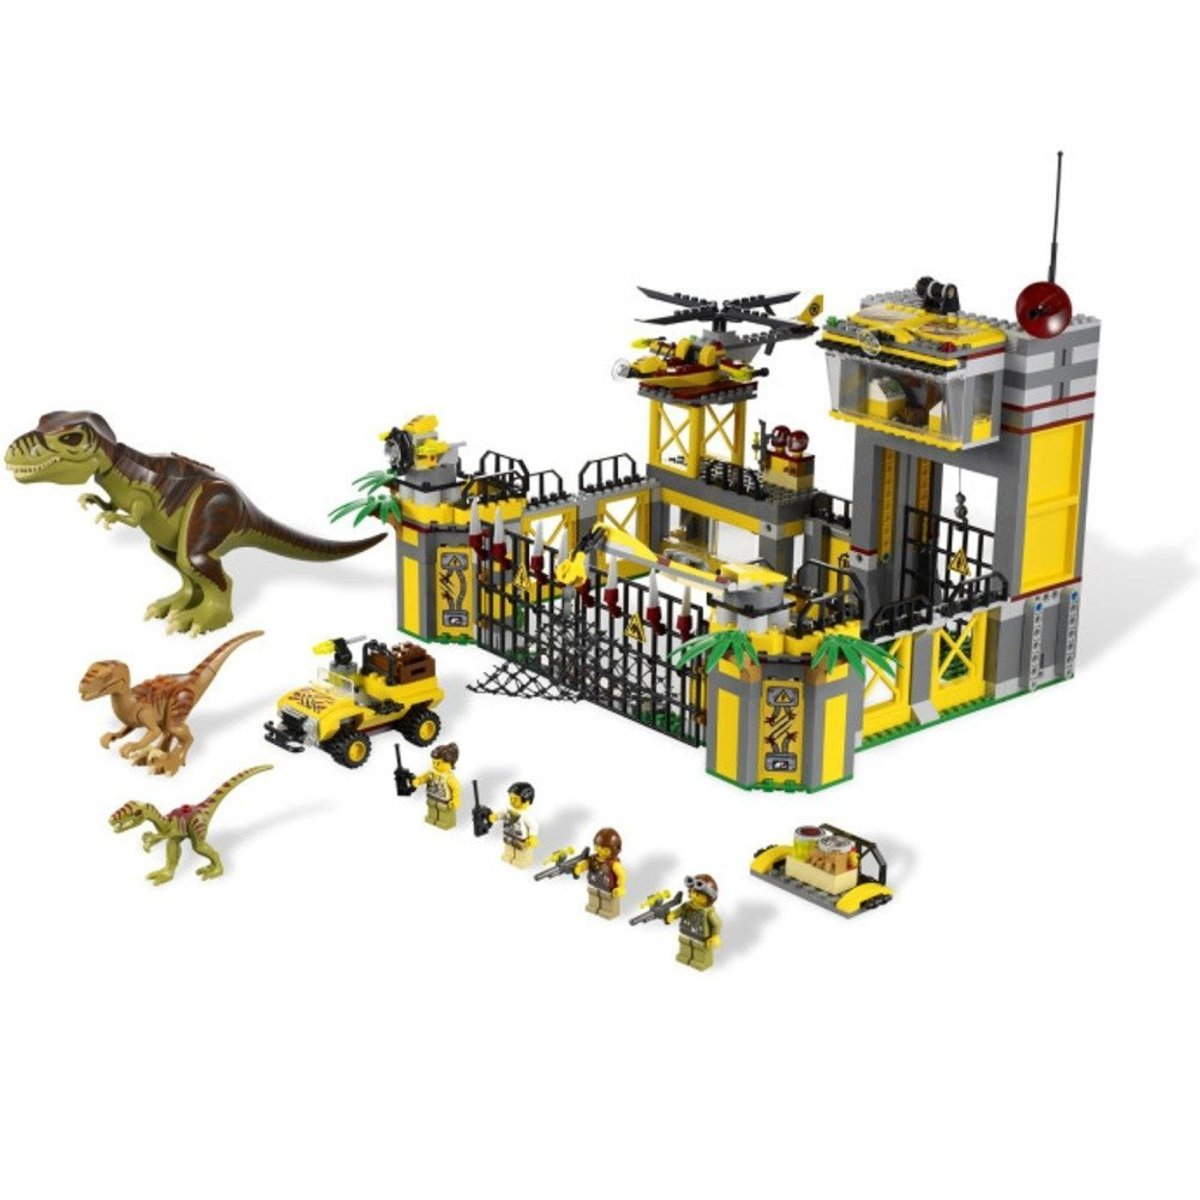 Lego dinosaur defence HQ 5887